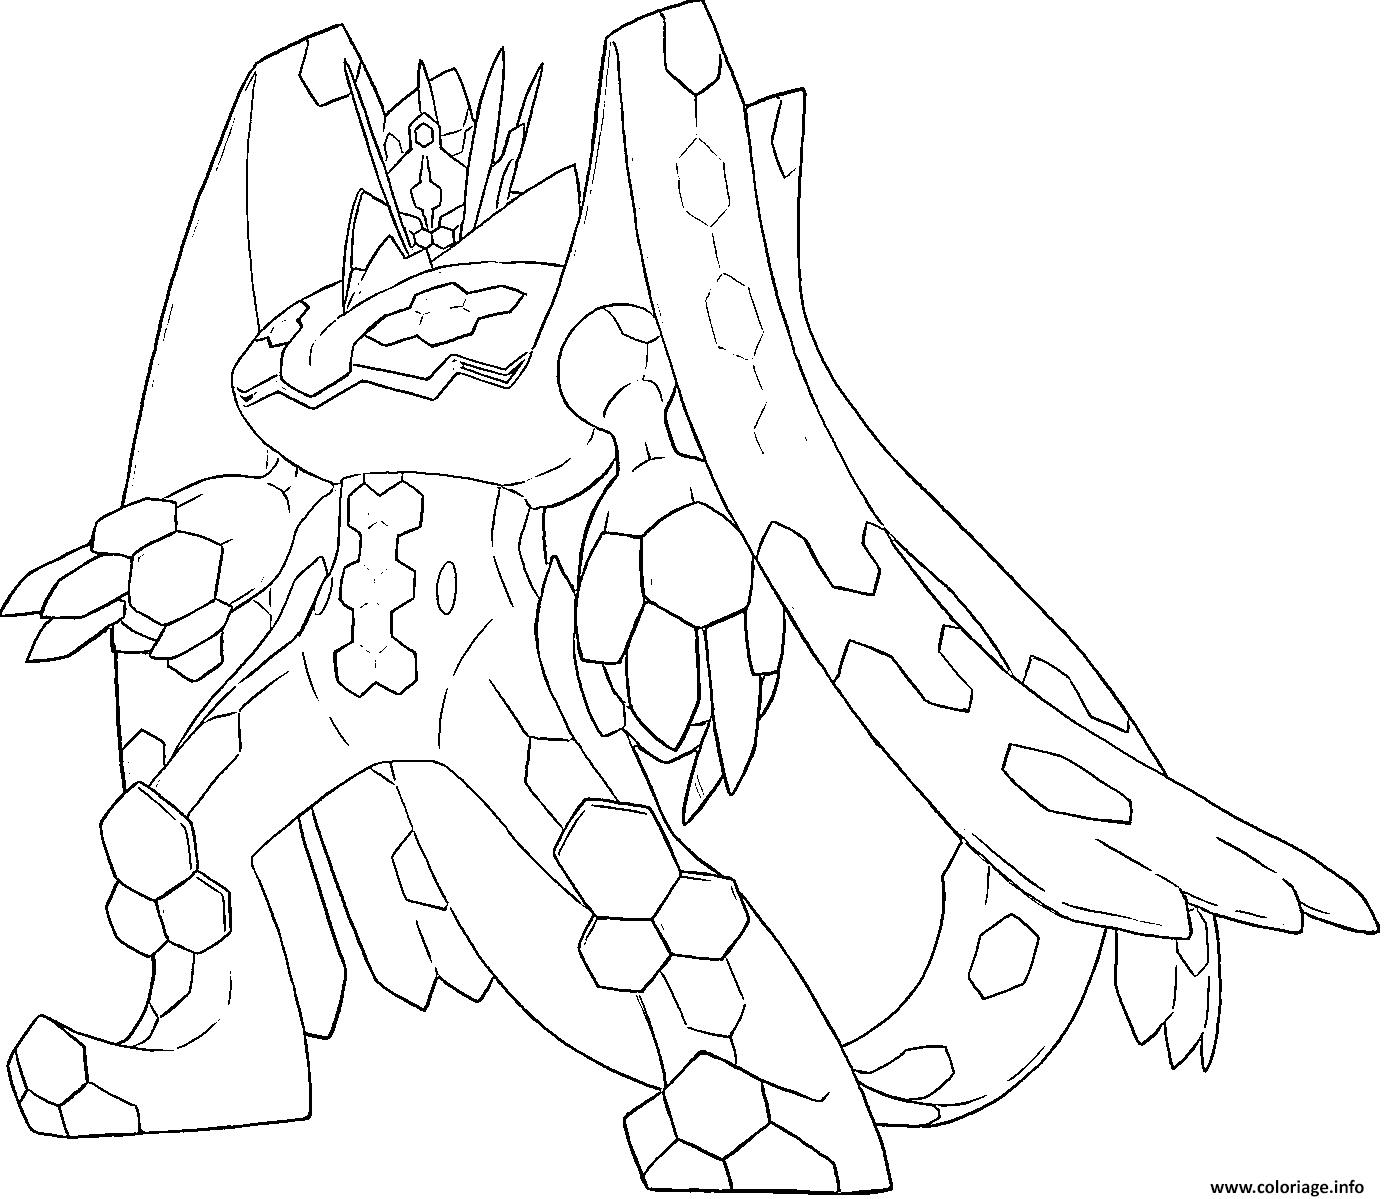 Coloriage Zygarde P Pokemon Generation 7 Dessin